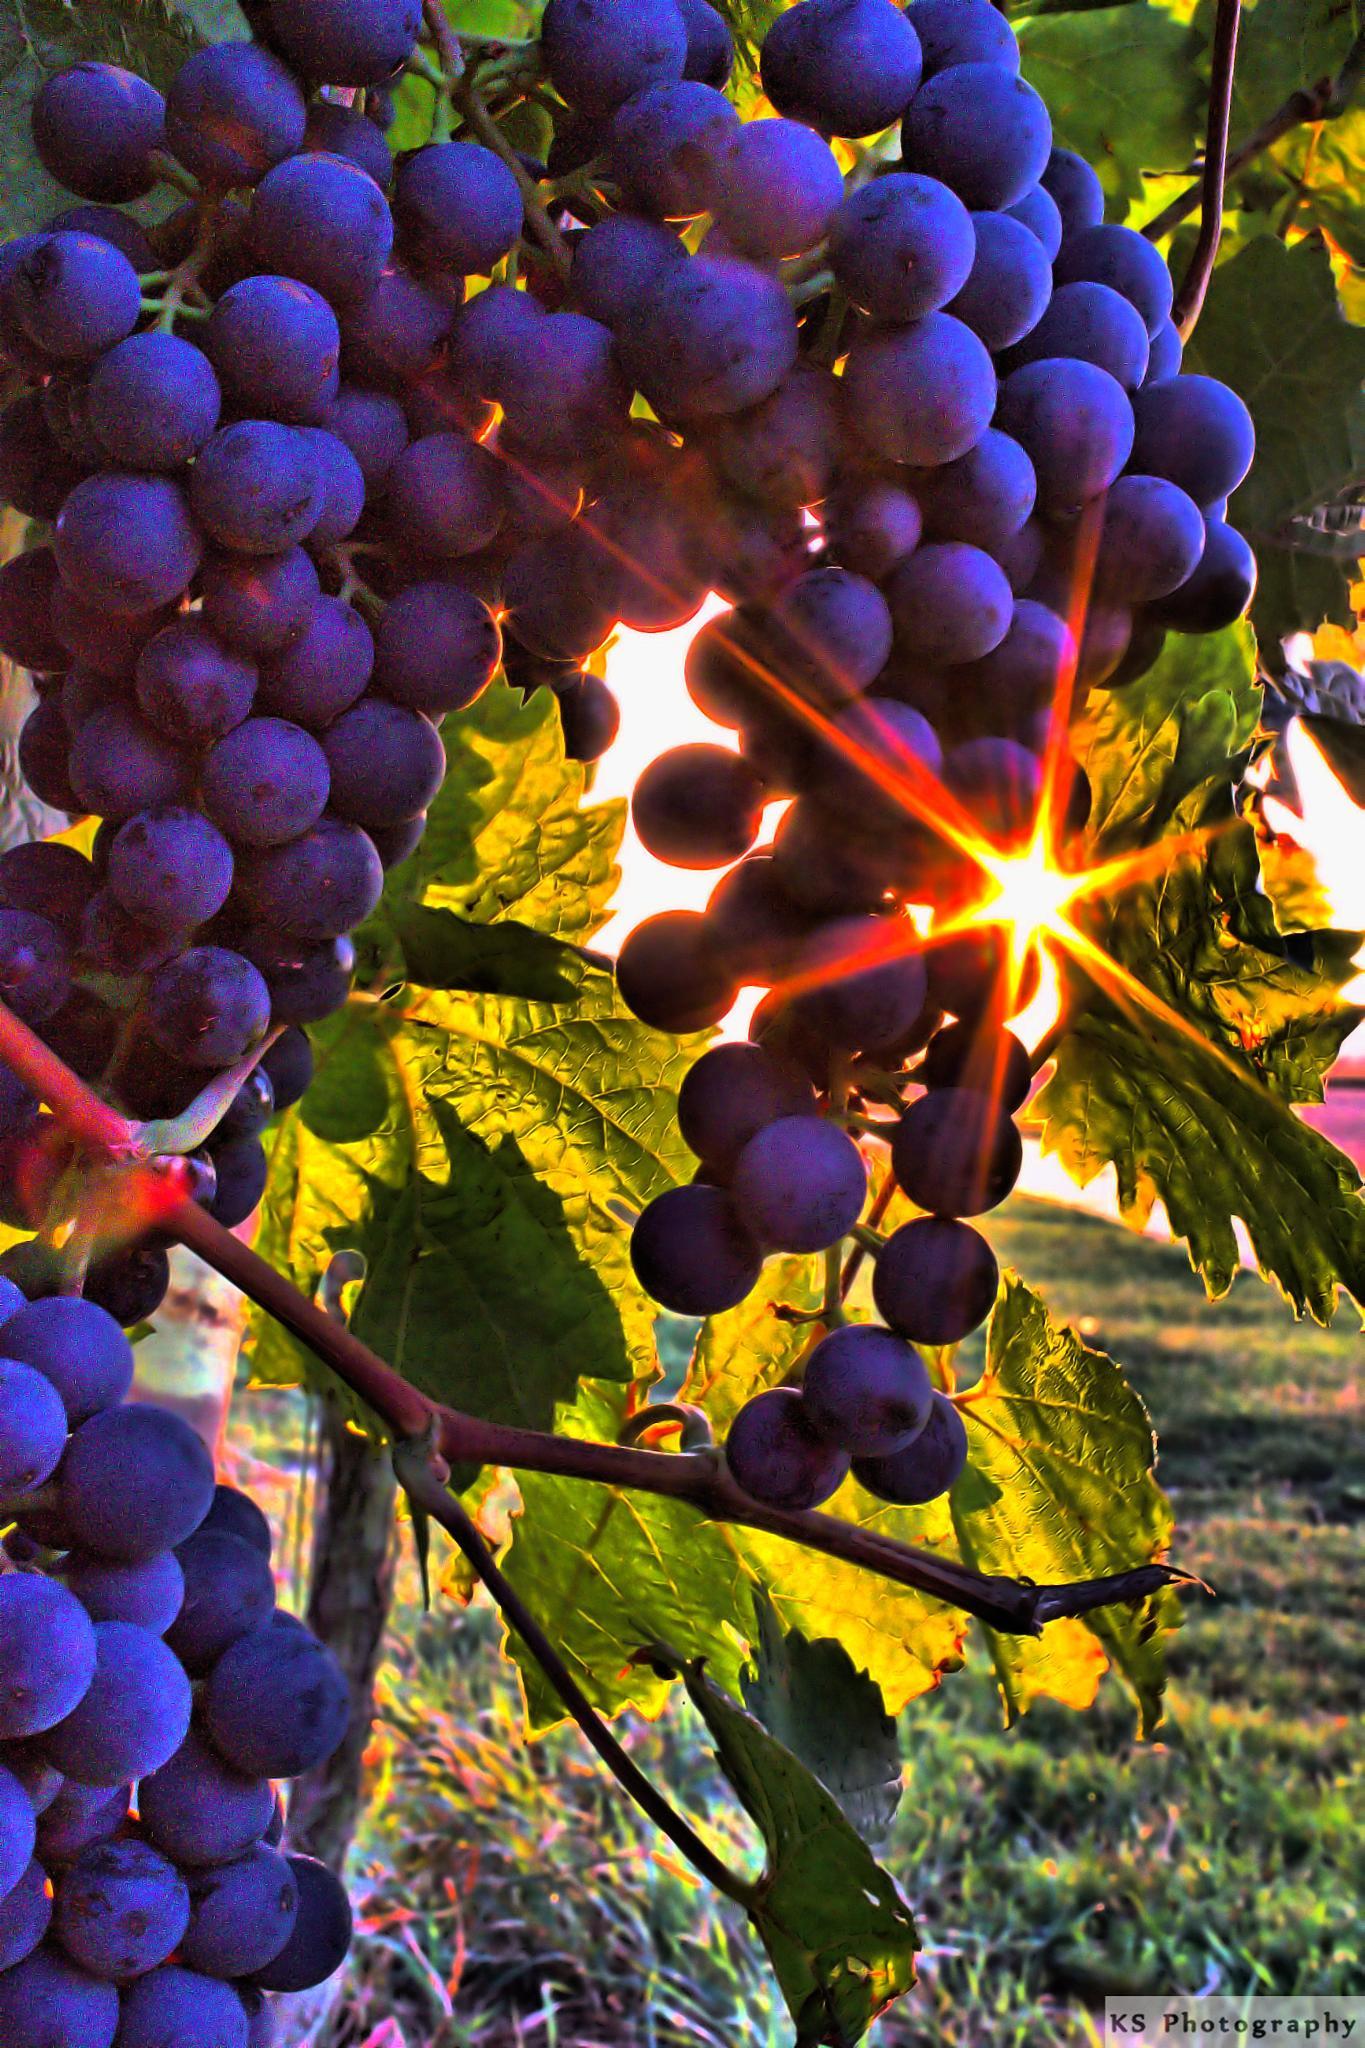 Grapes by Klaus Schenker